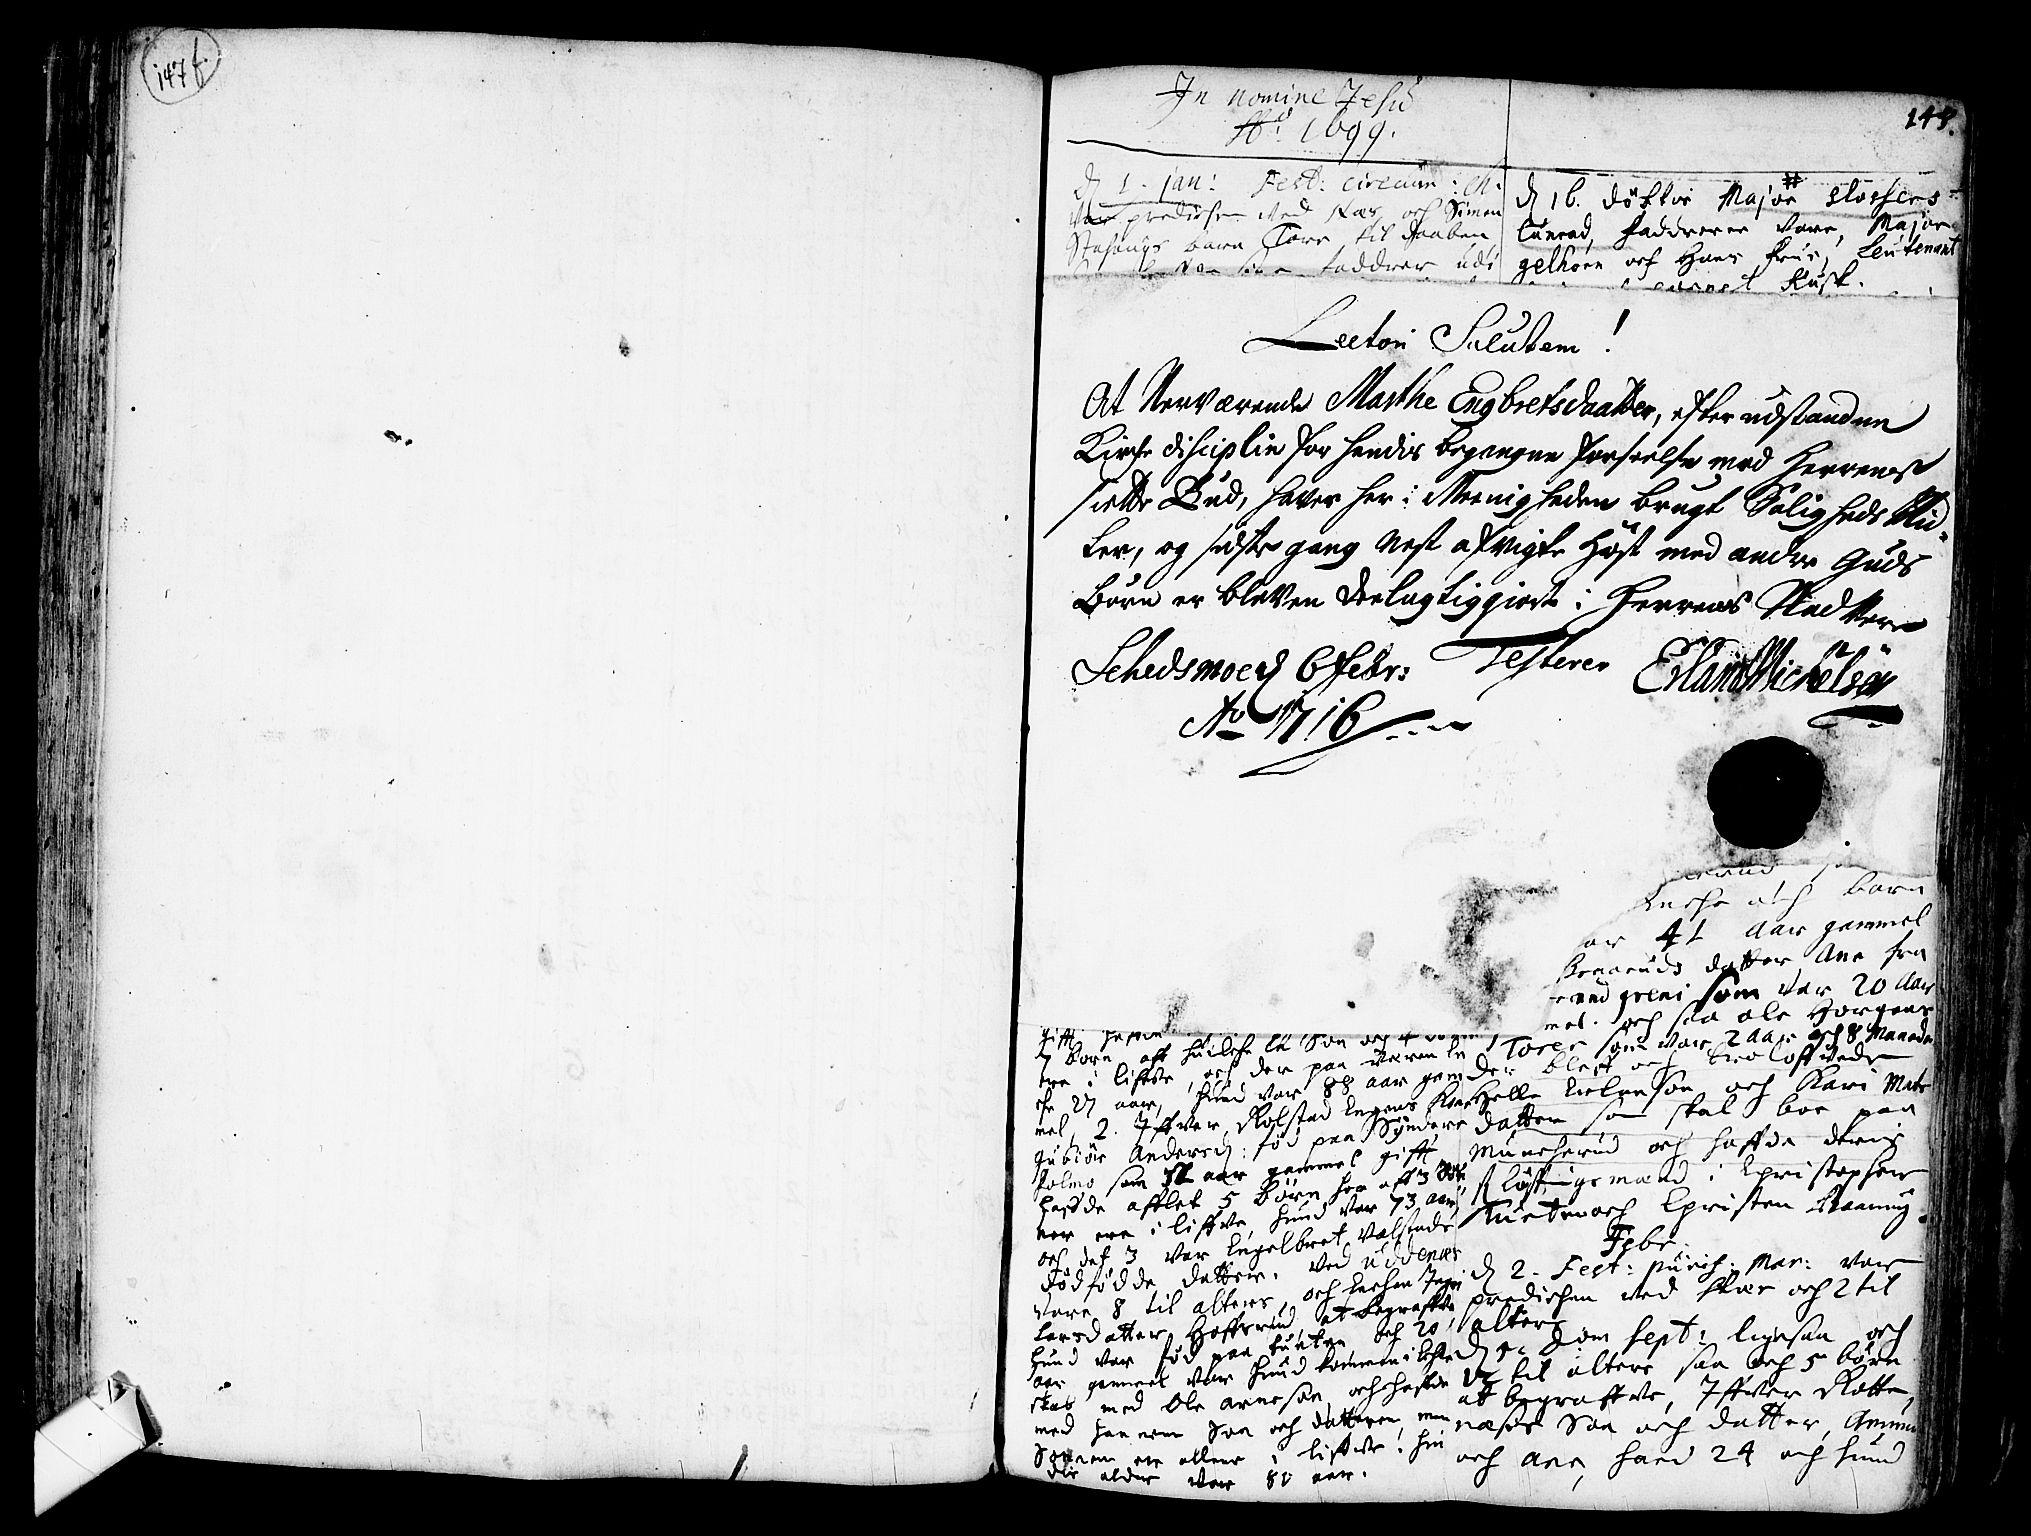 SAO, Nes prestekontor Kirkebøker, F/Fa/L0001: Parish register (official) no. I 1, 1689-1716, p. 147f